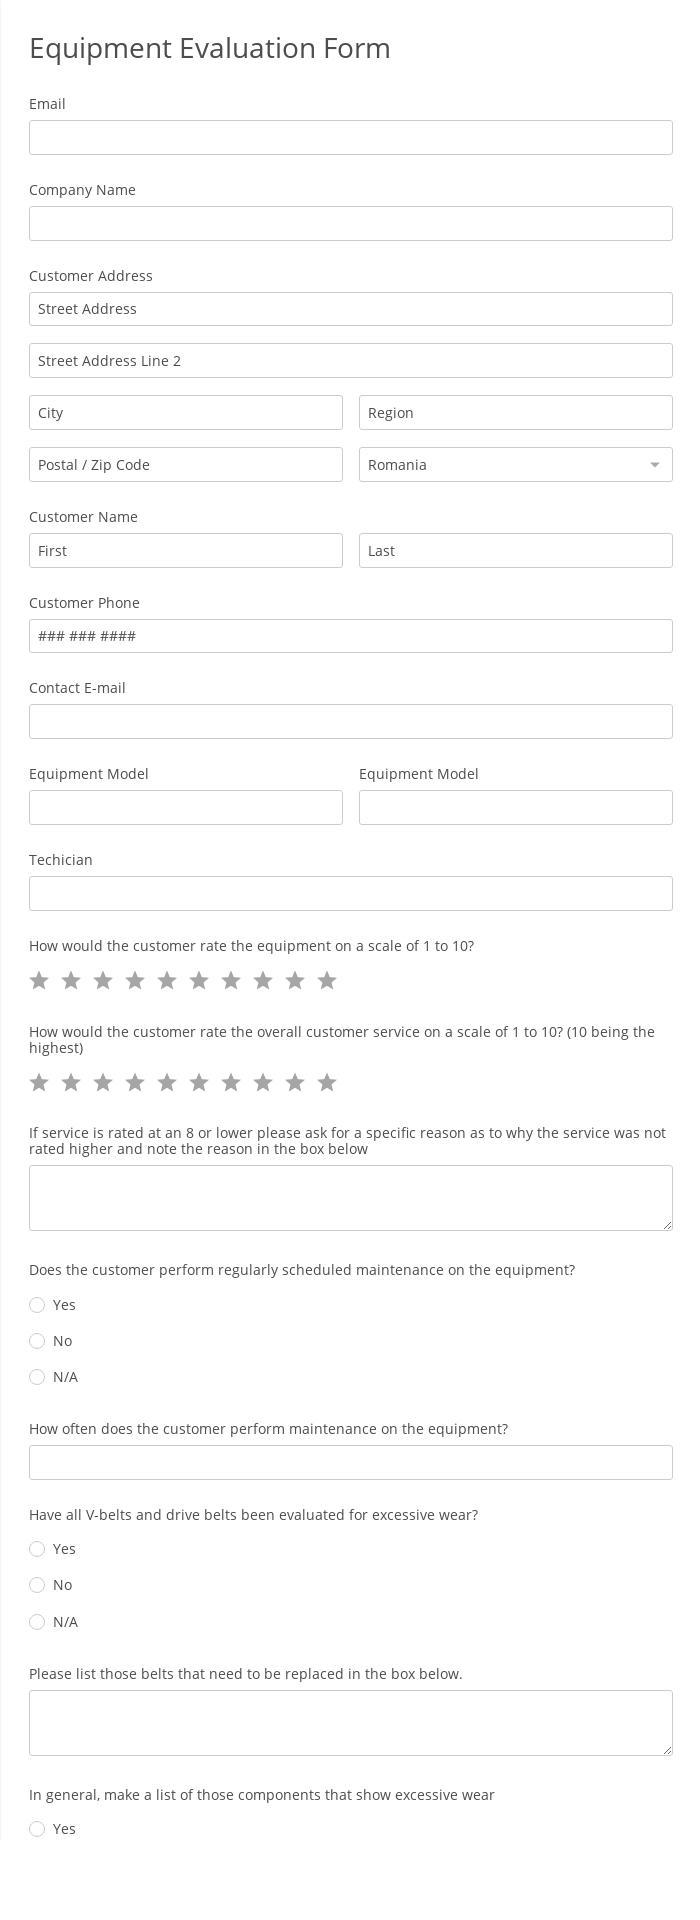 Equipment Evaluation Form